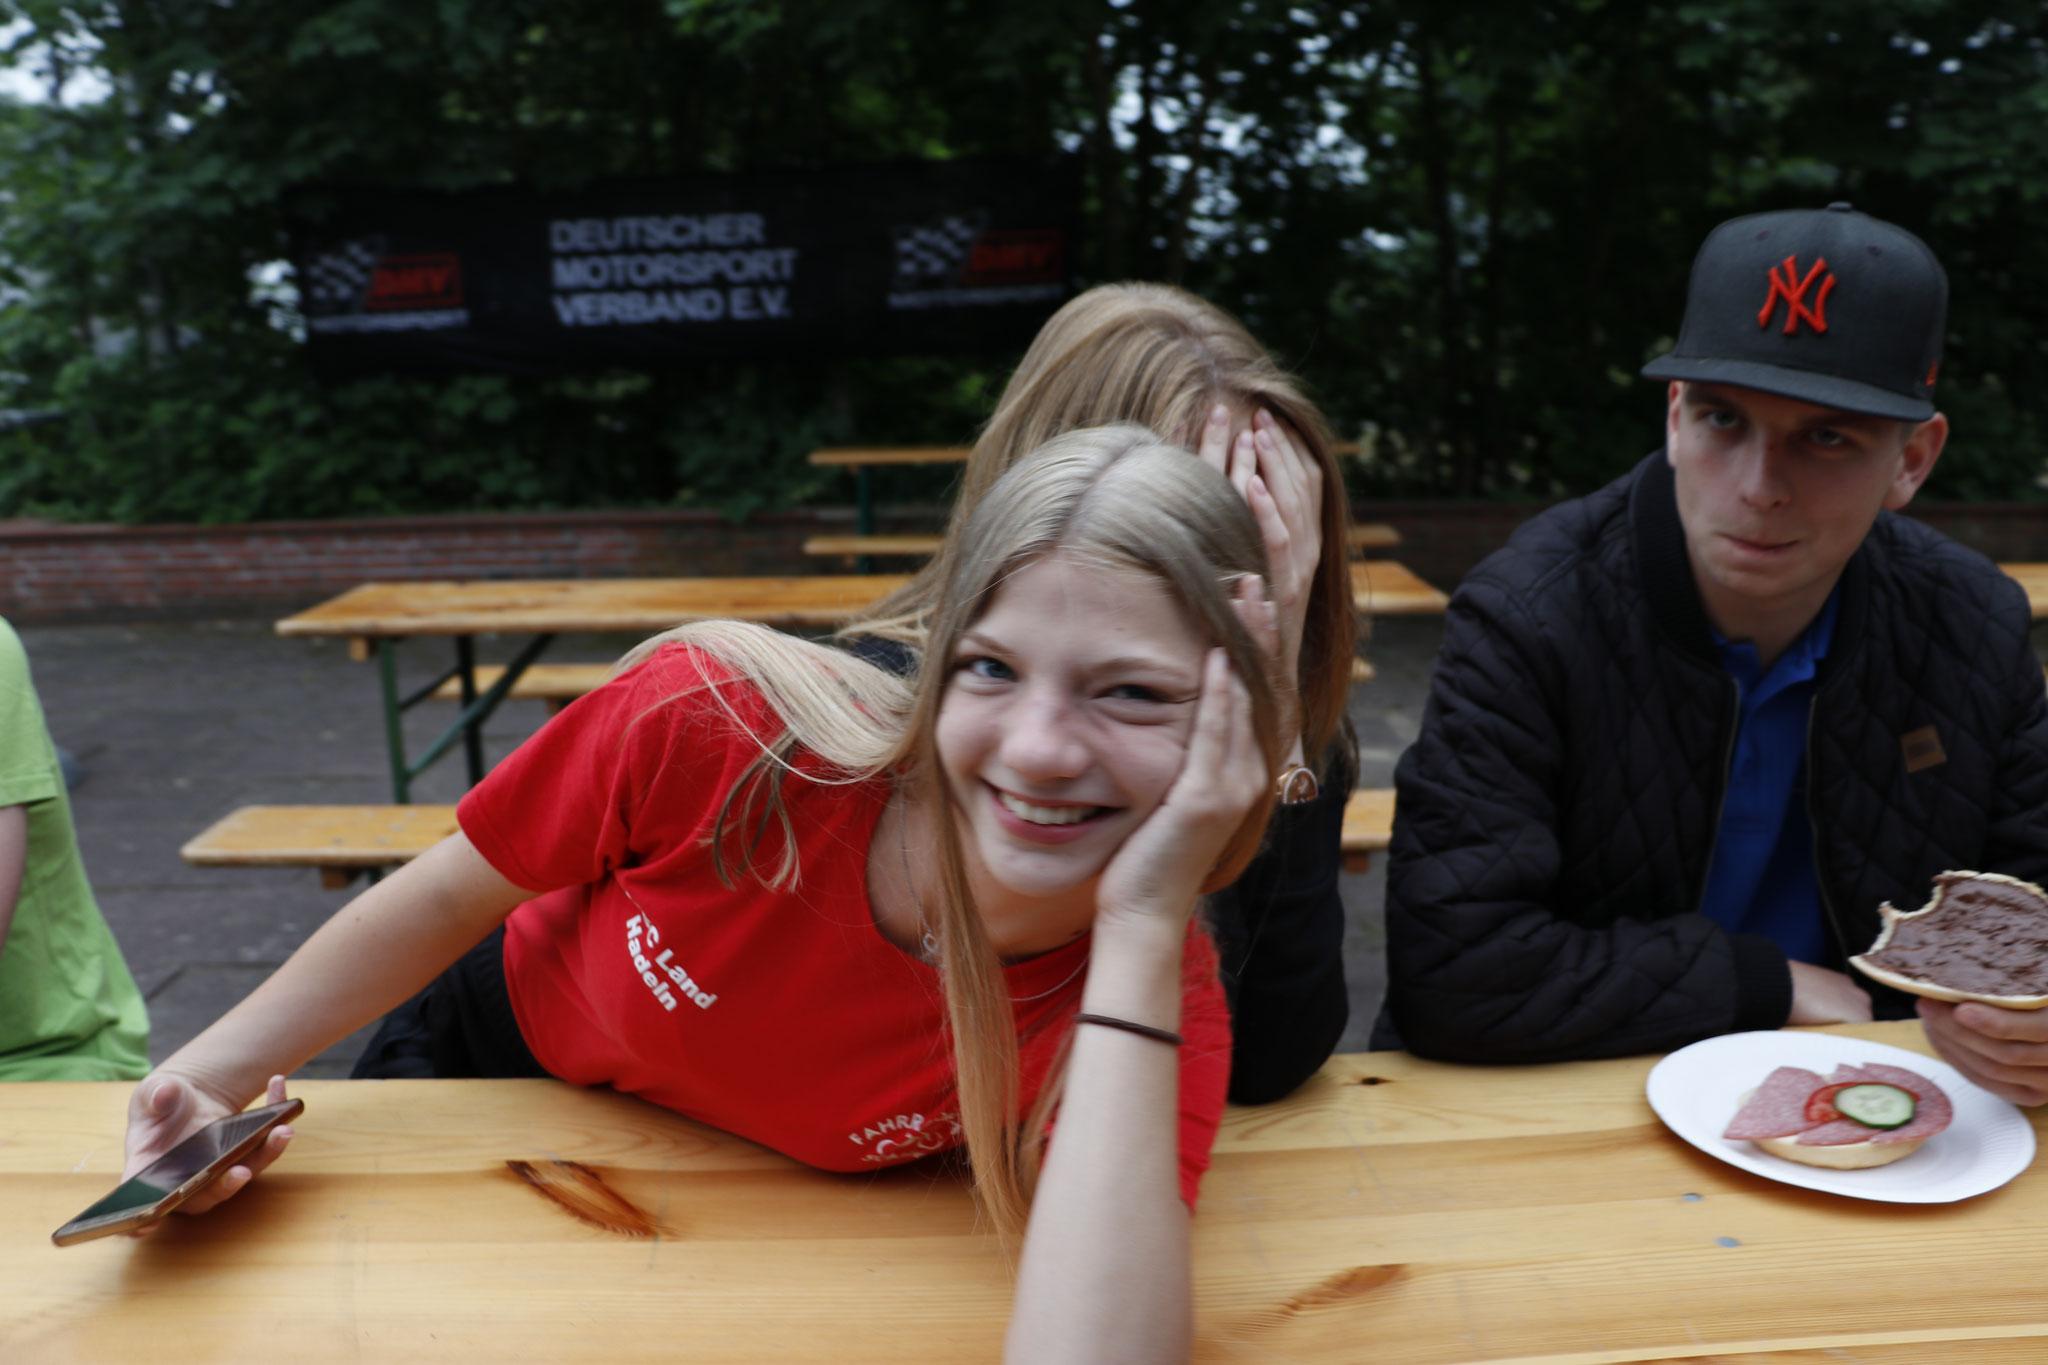 v.li. Alicia Föge und Mathias Staritz (MC Blau Weiß Sanitz)